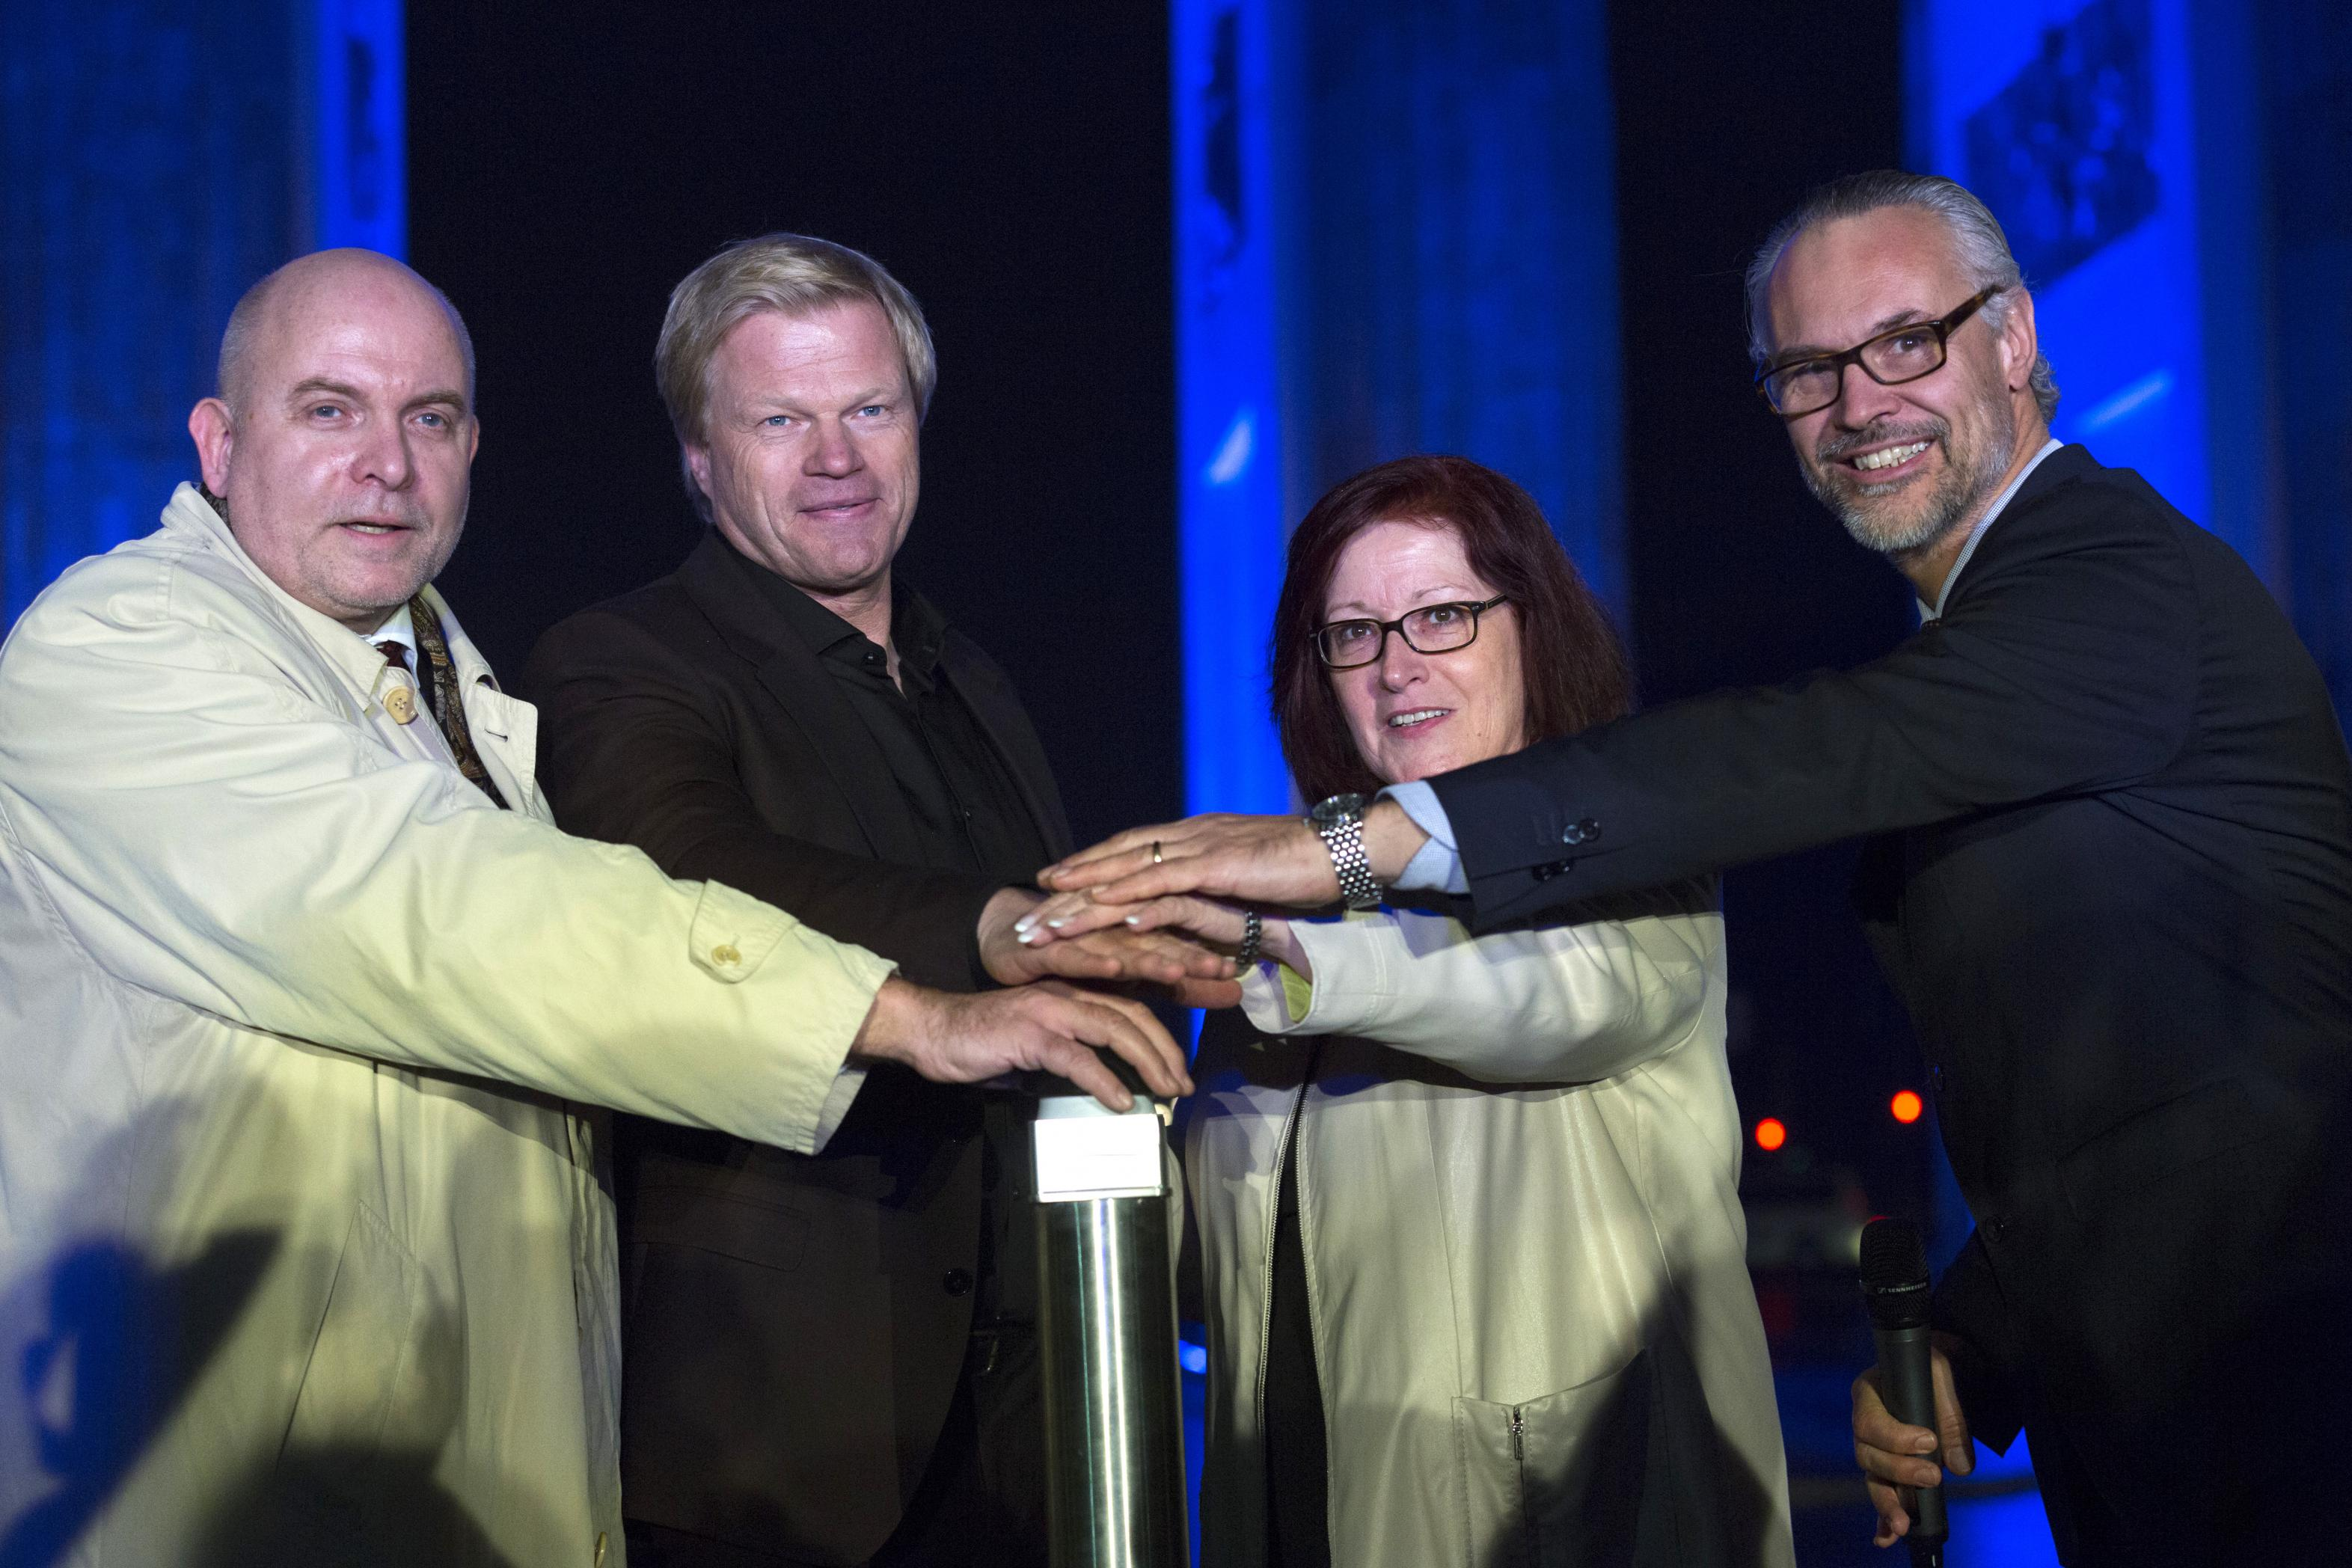 Weltdiabetestag 2014 - u.a. mit Oliver Kahn & Prof. Dr. Thomas Danne